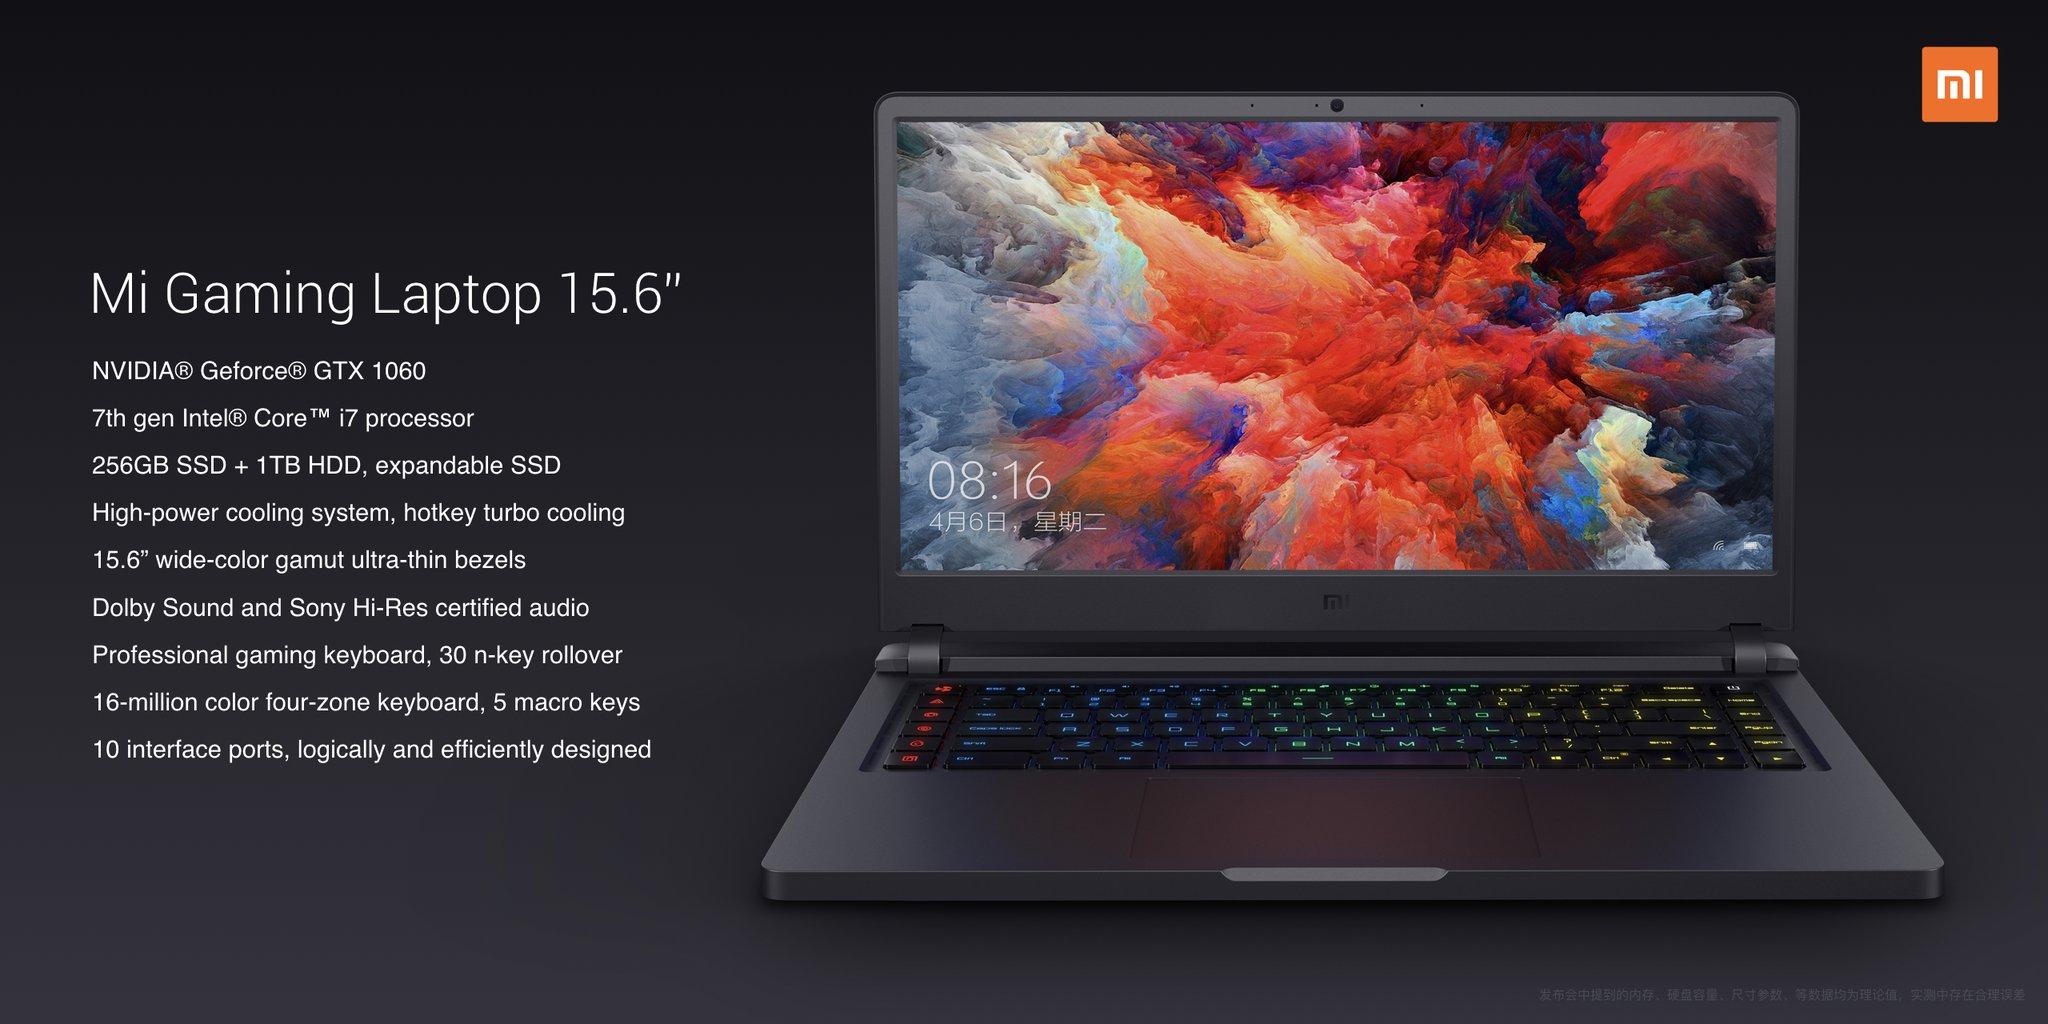 Xiaomi Gaming Laptop Wallpaper: Xiaomi Announces New Mi Gaming Laptop With NVIDIA GTX 1060